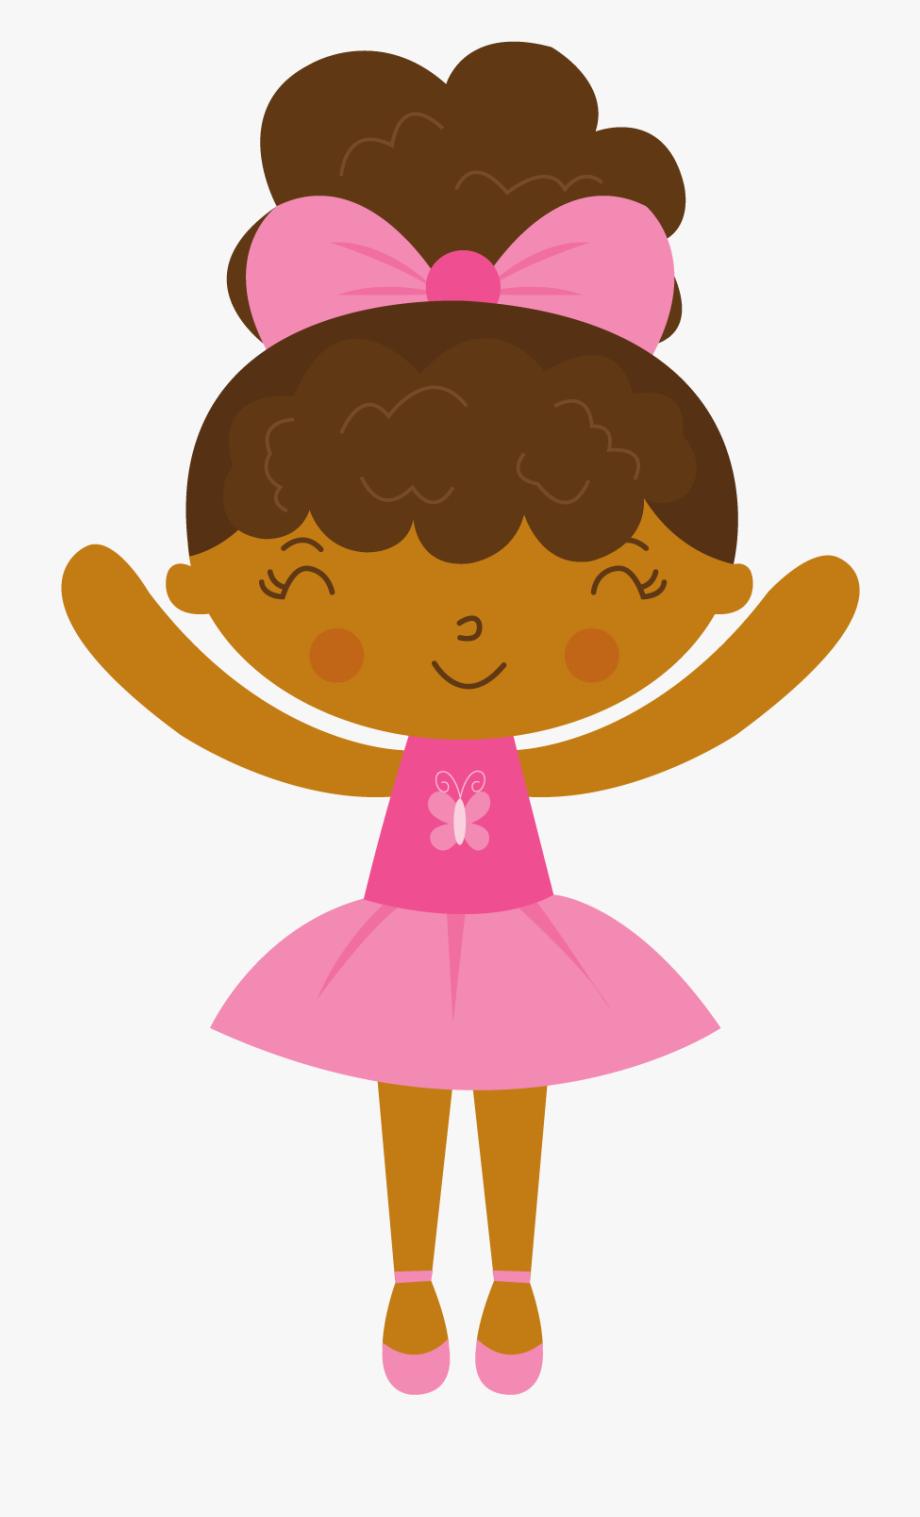 Bailarina Png Minus Pinterest Clip Art Ballerinapng.